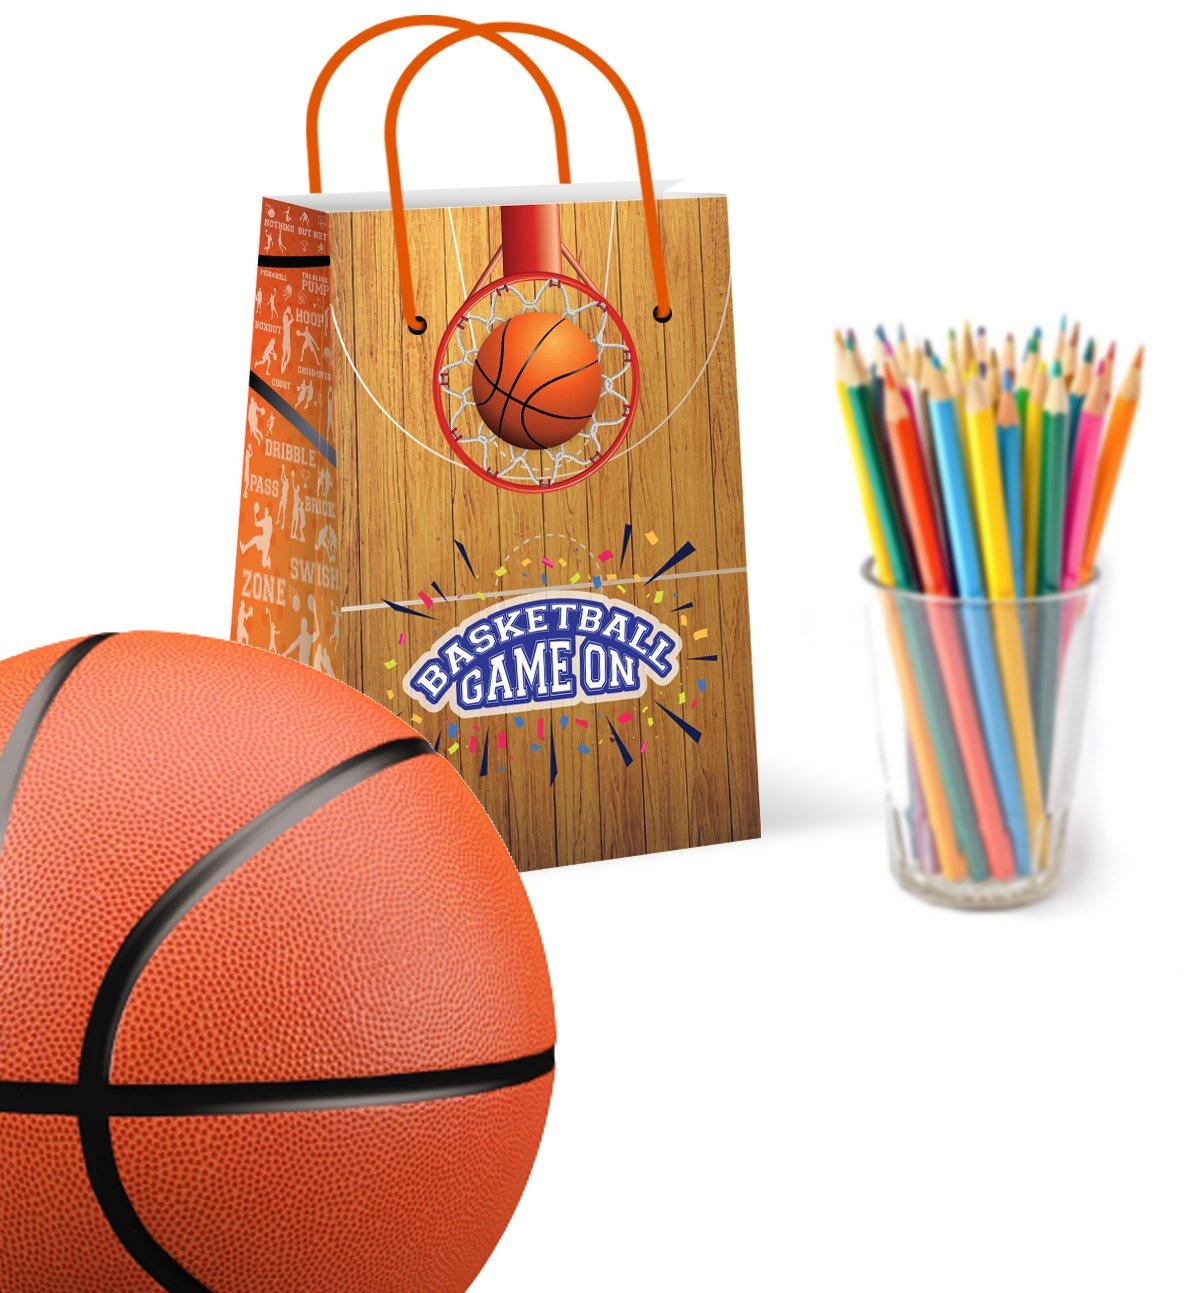 Amazon.com: Bolsas de baloncesto premium, bolsas de regalo ...